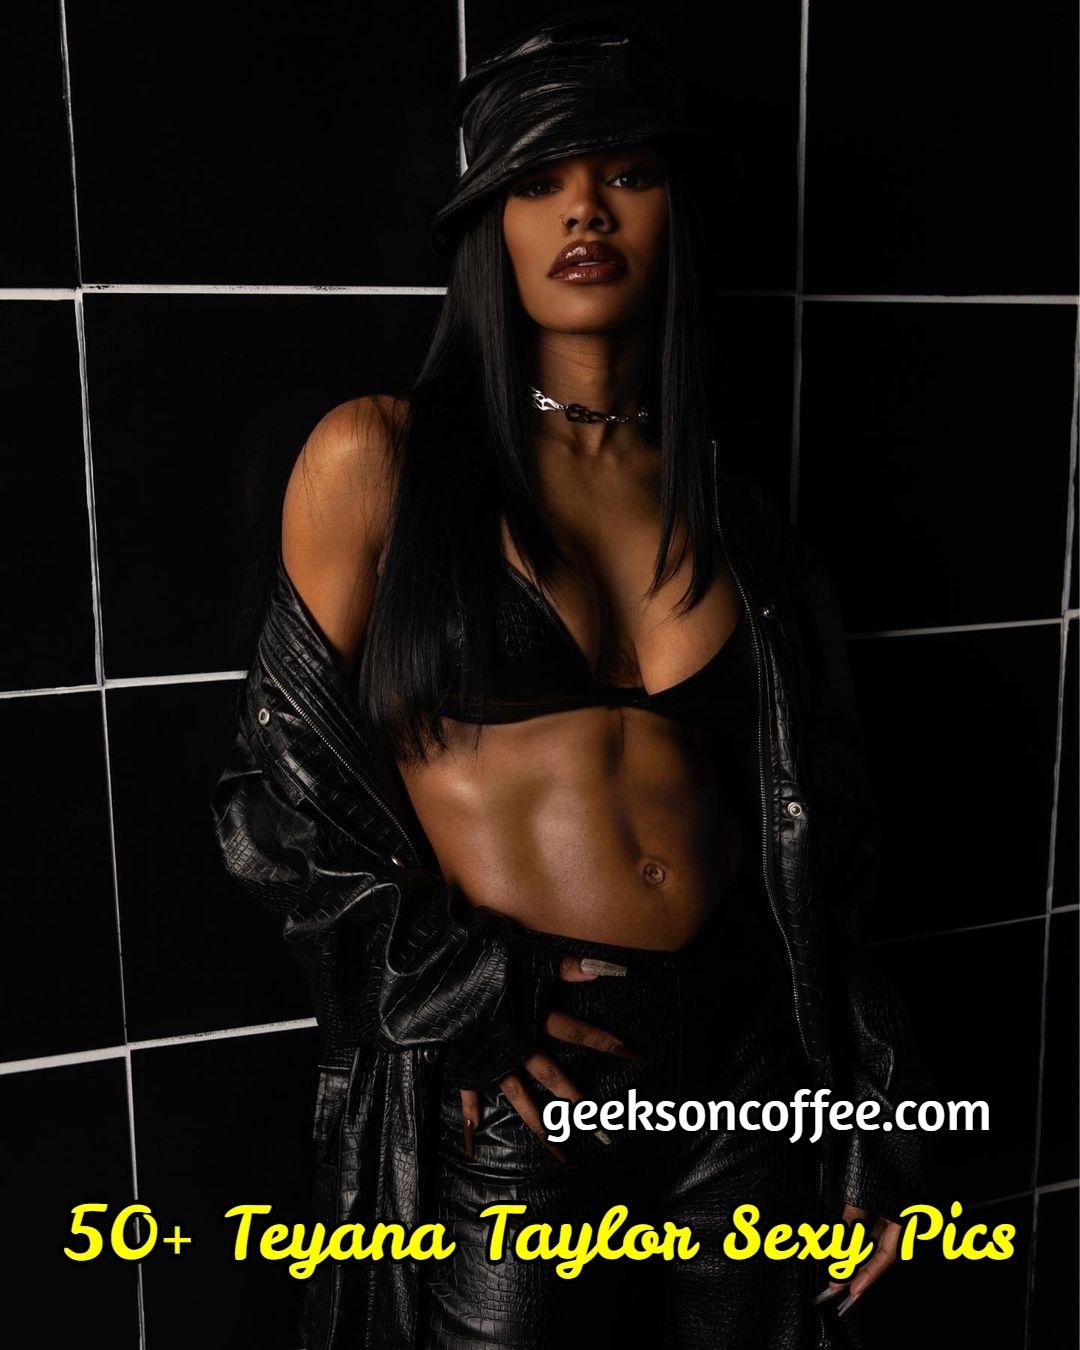 Teyana Taylor Sexy Pics